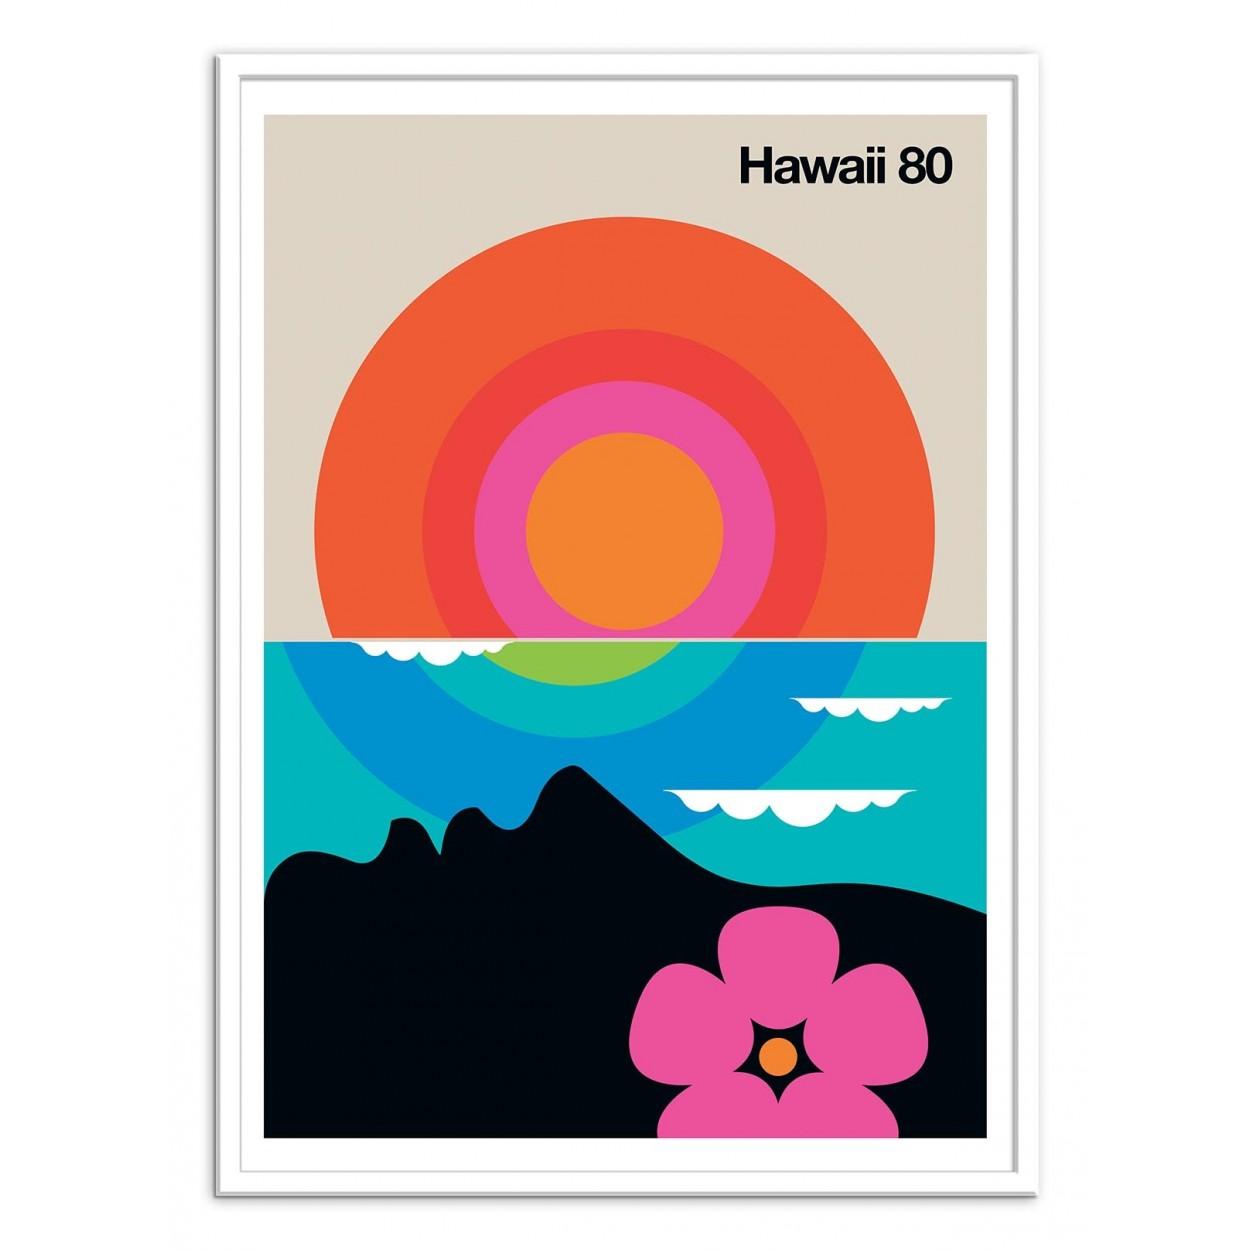 affiche art poster et decoration de hawaii en style design retro. Black Bedroom Furniture Sets. Home Design Ideas